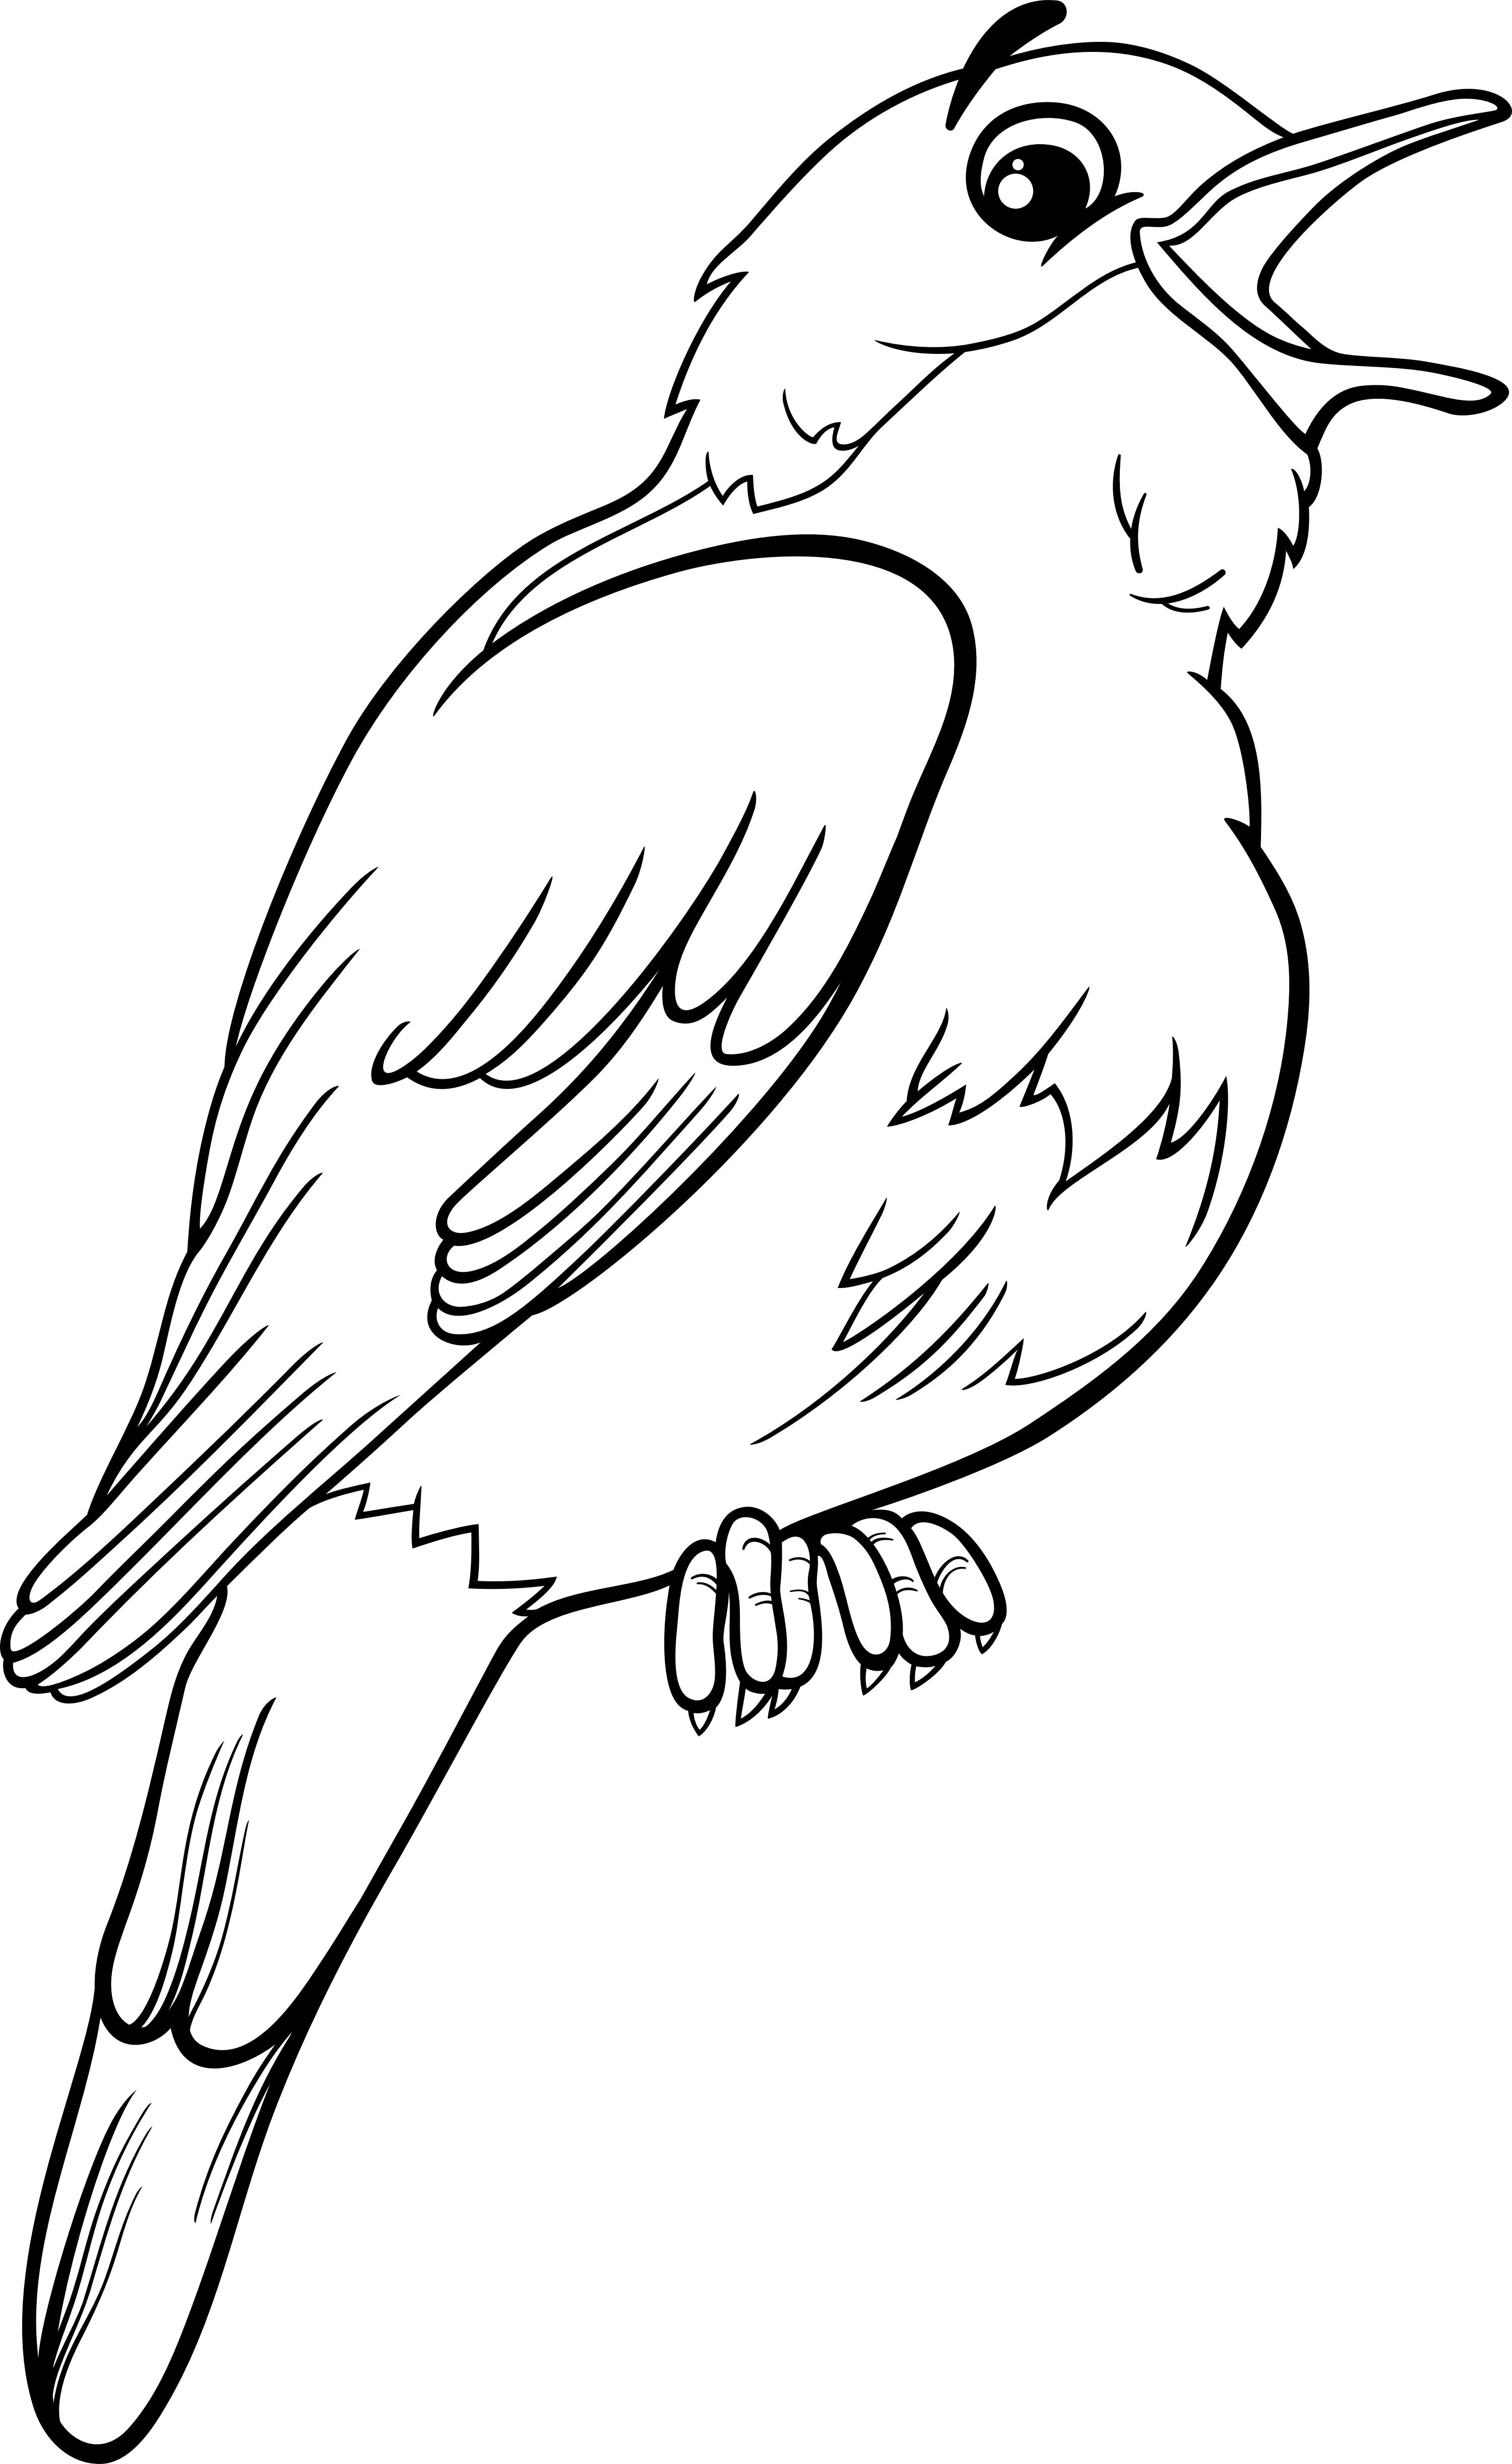 Bird colouring page printable